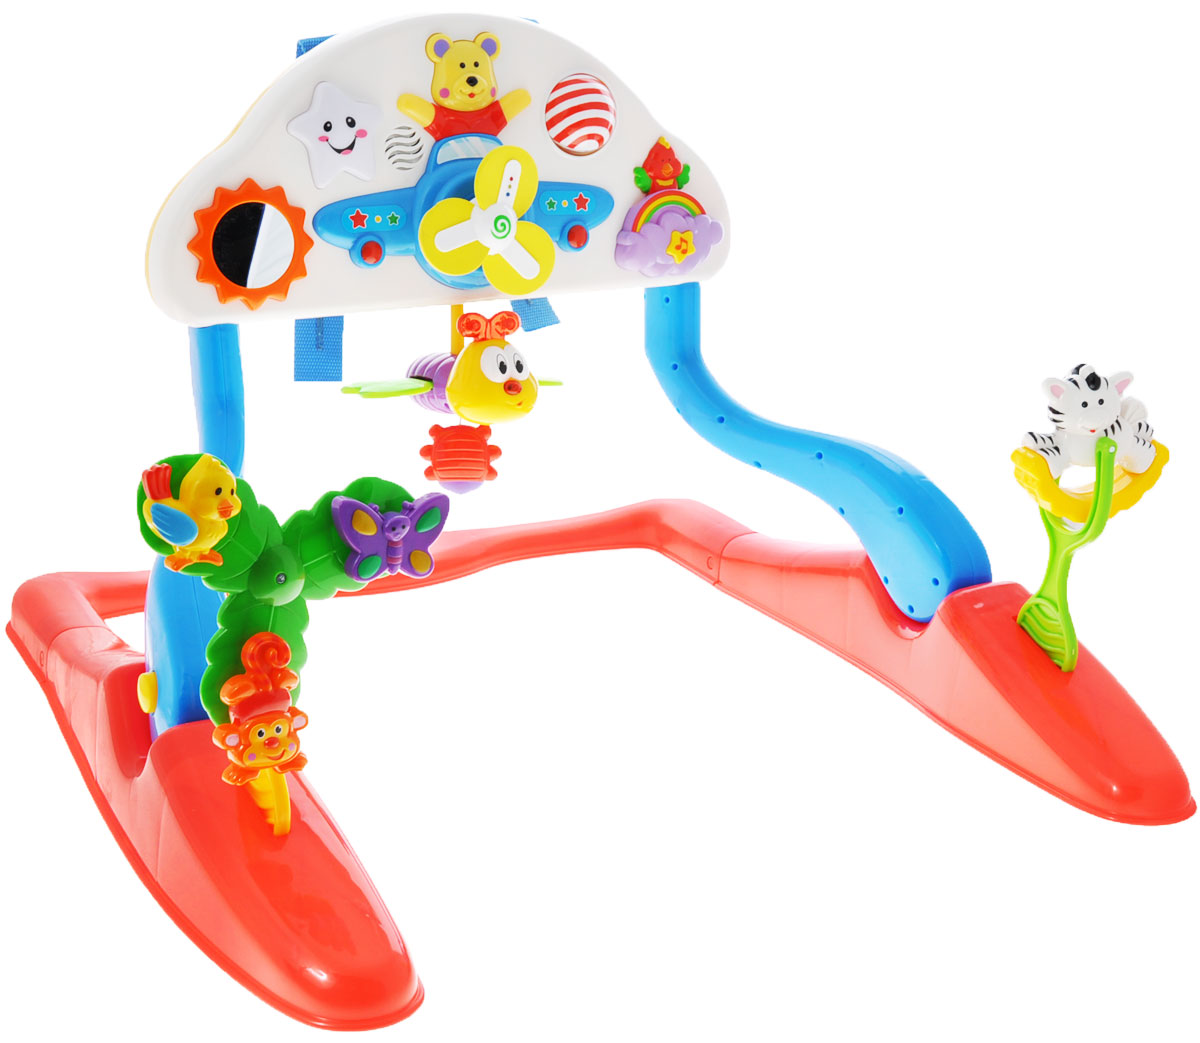 "Kiddieland Развивающий гимнастический центр для малыша ""Flyng fun"""